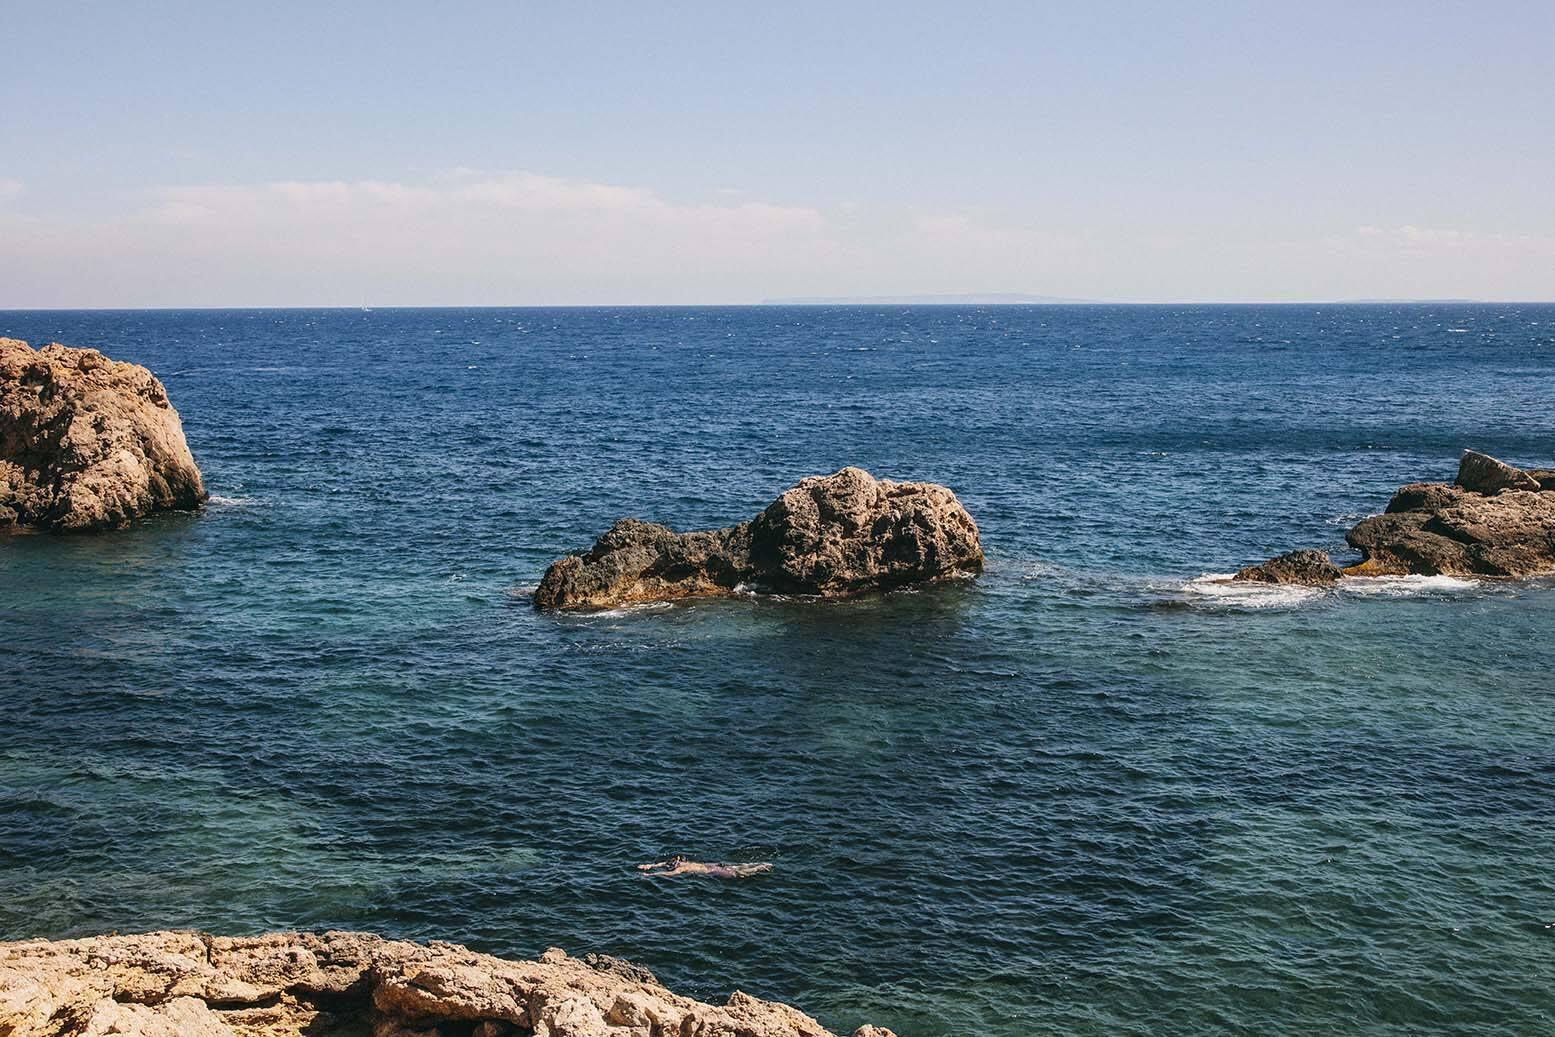 Cala olivera a beautiful tranquil spot in ibiza estrella damm - Roca llisa ibiza ...